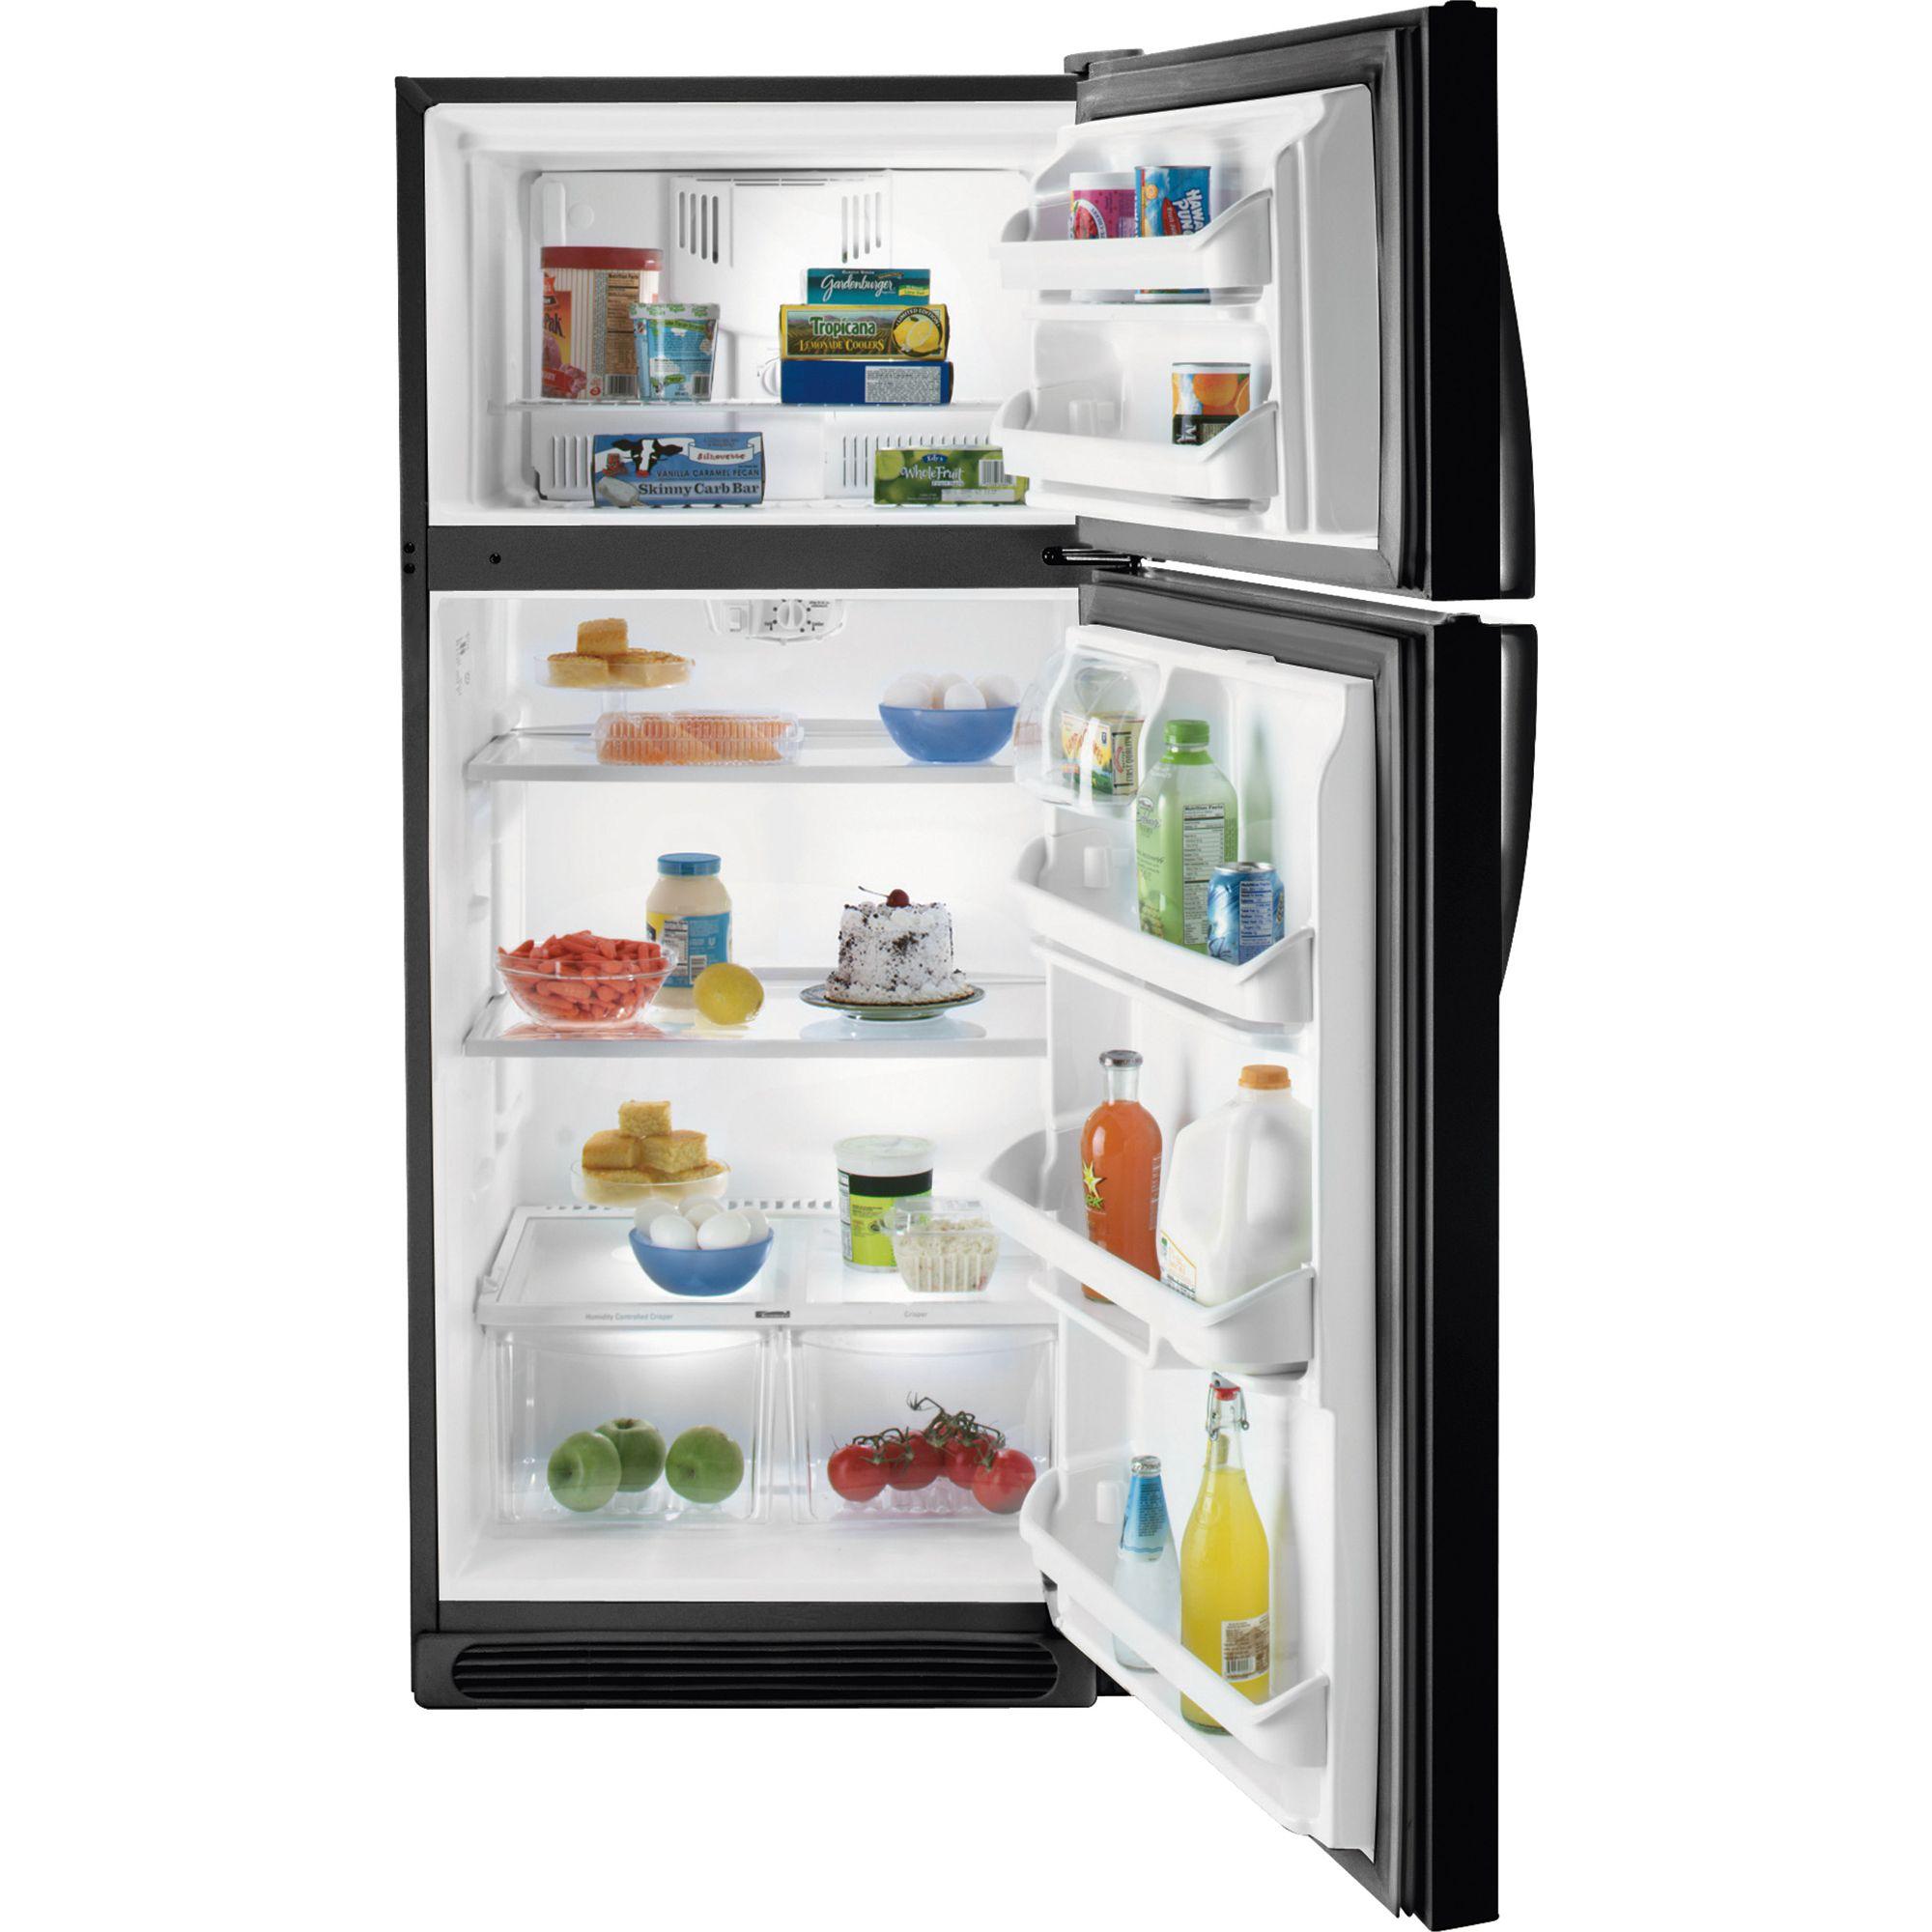 Kenmore 18.2 cu. ft. Top-Freezer Refrigerator